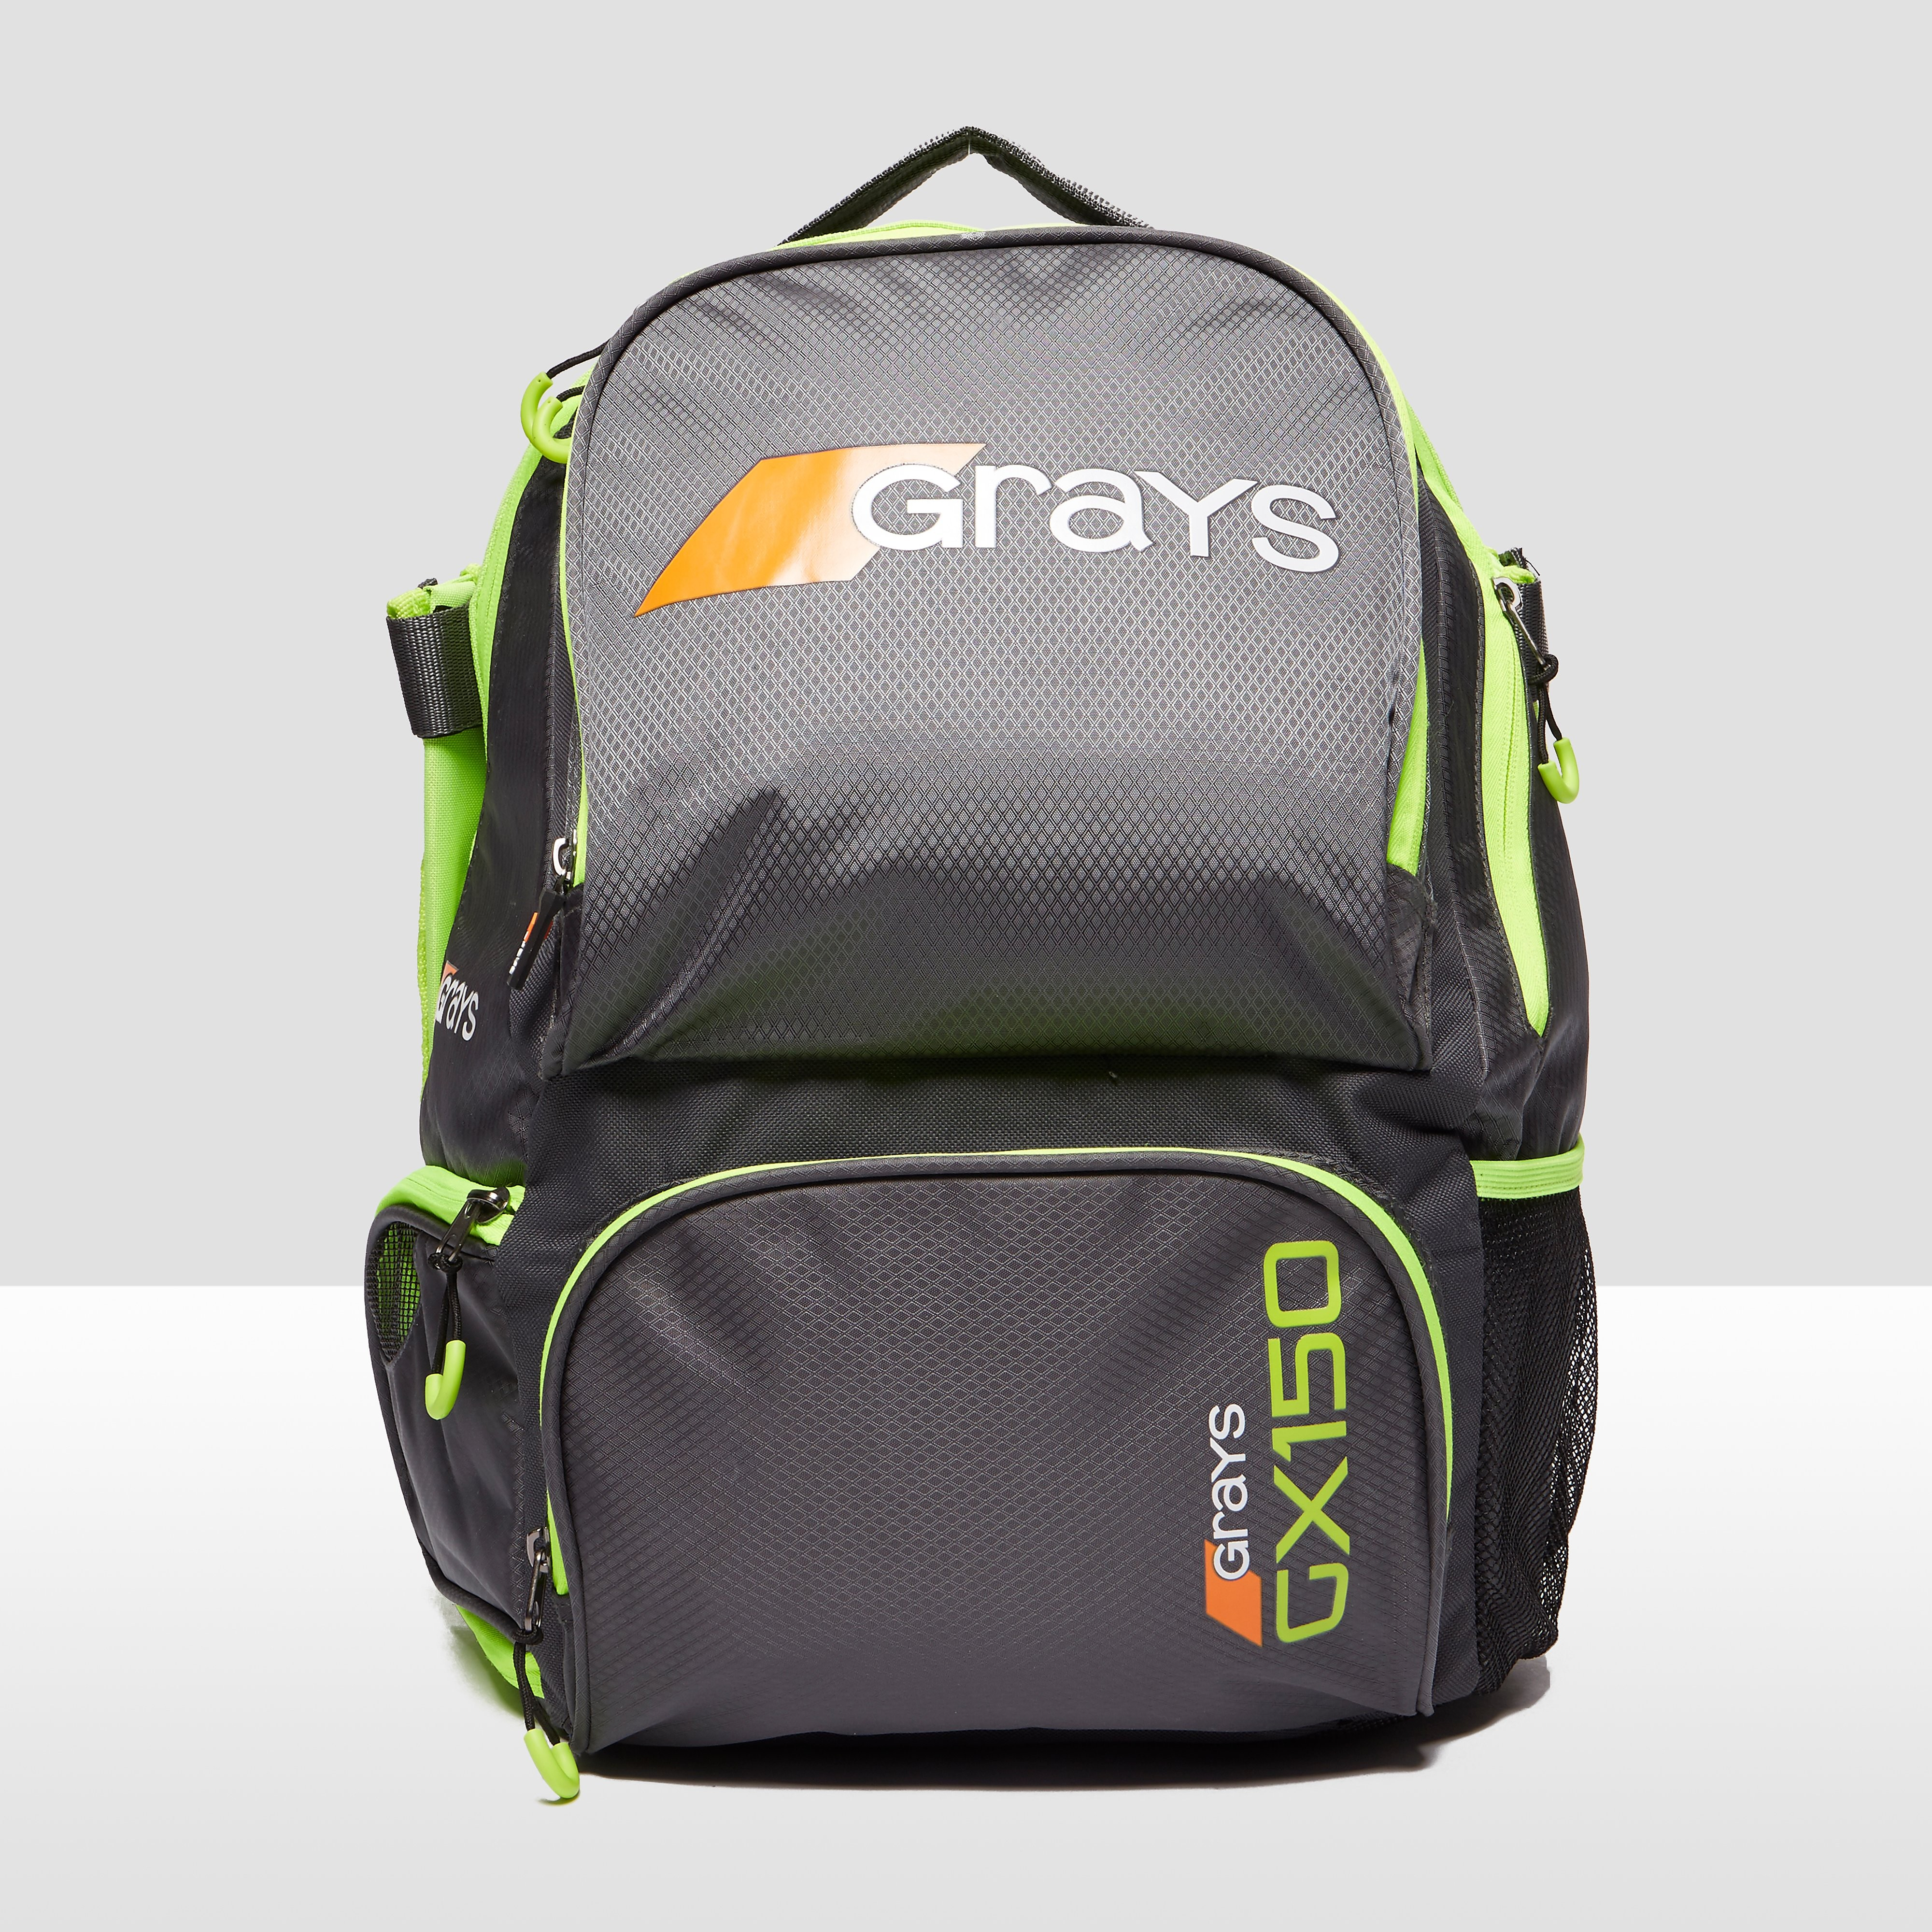 Grays GX150 Backpack